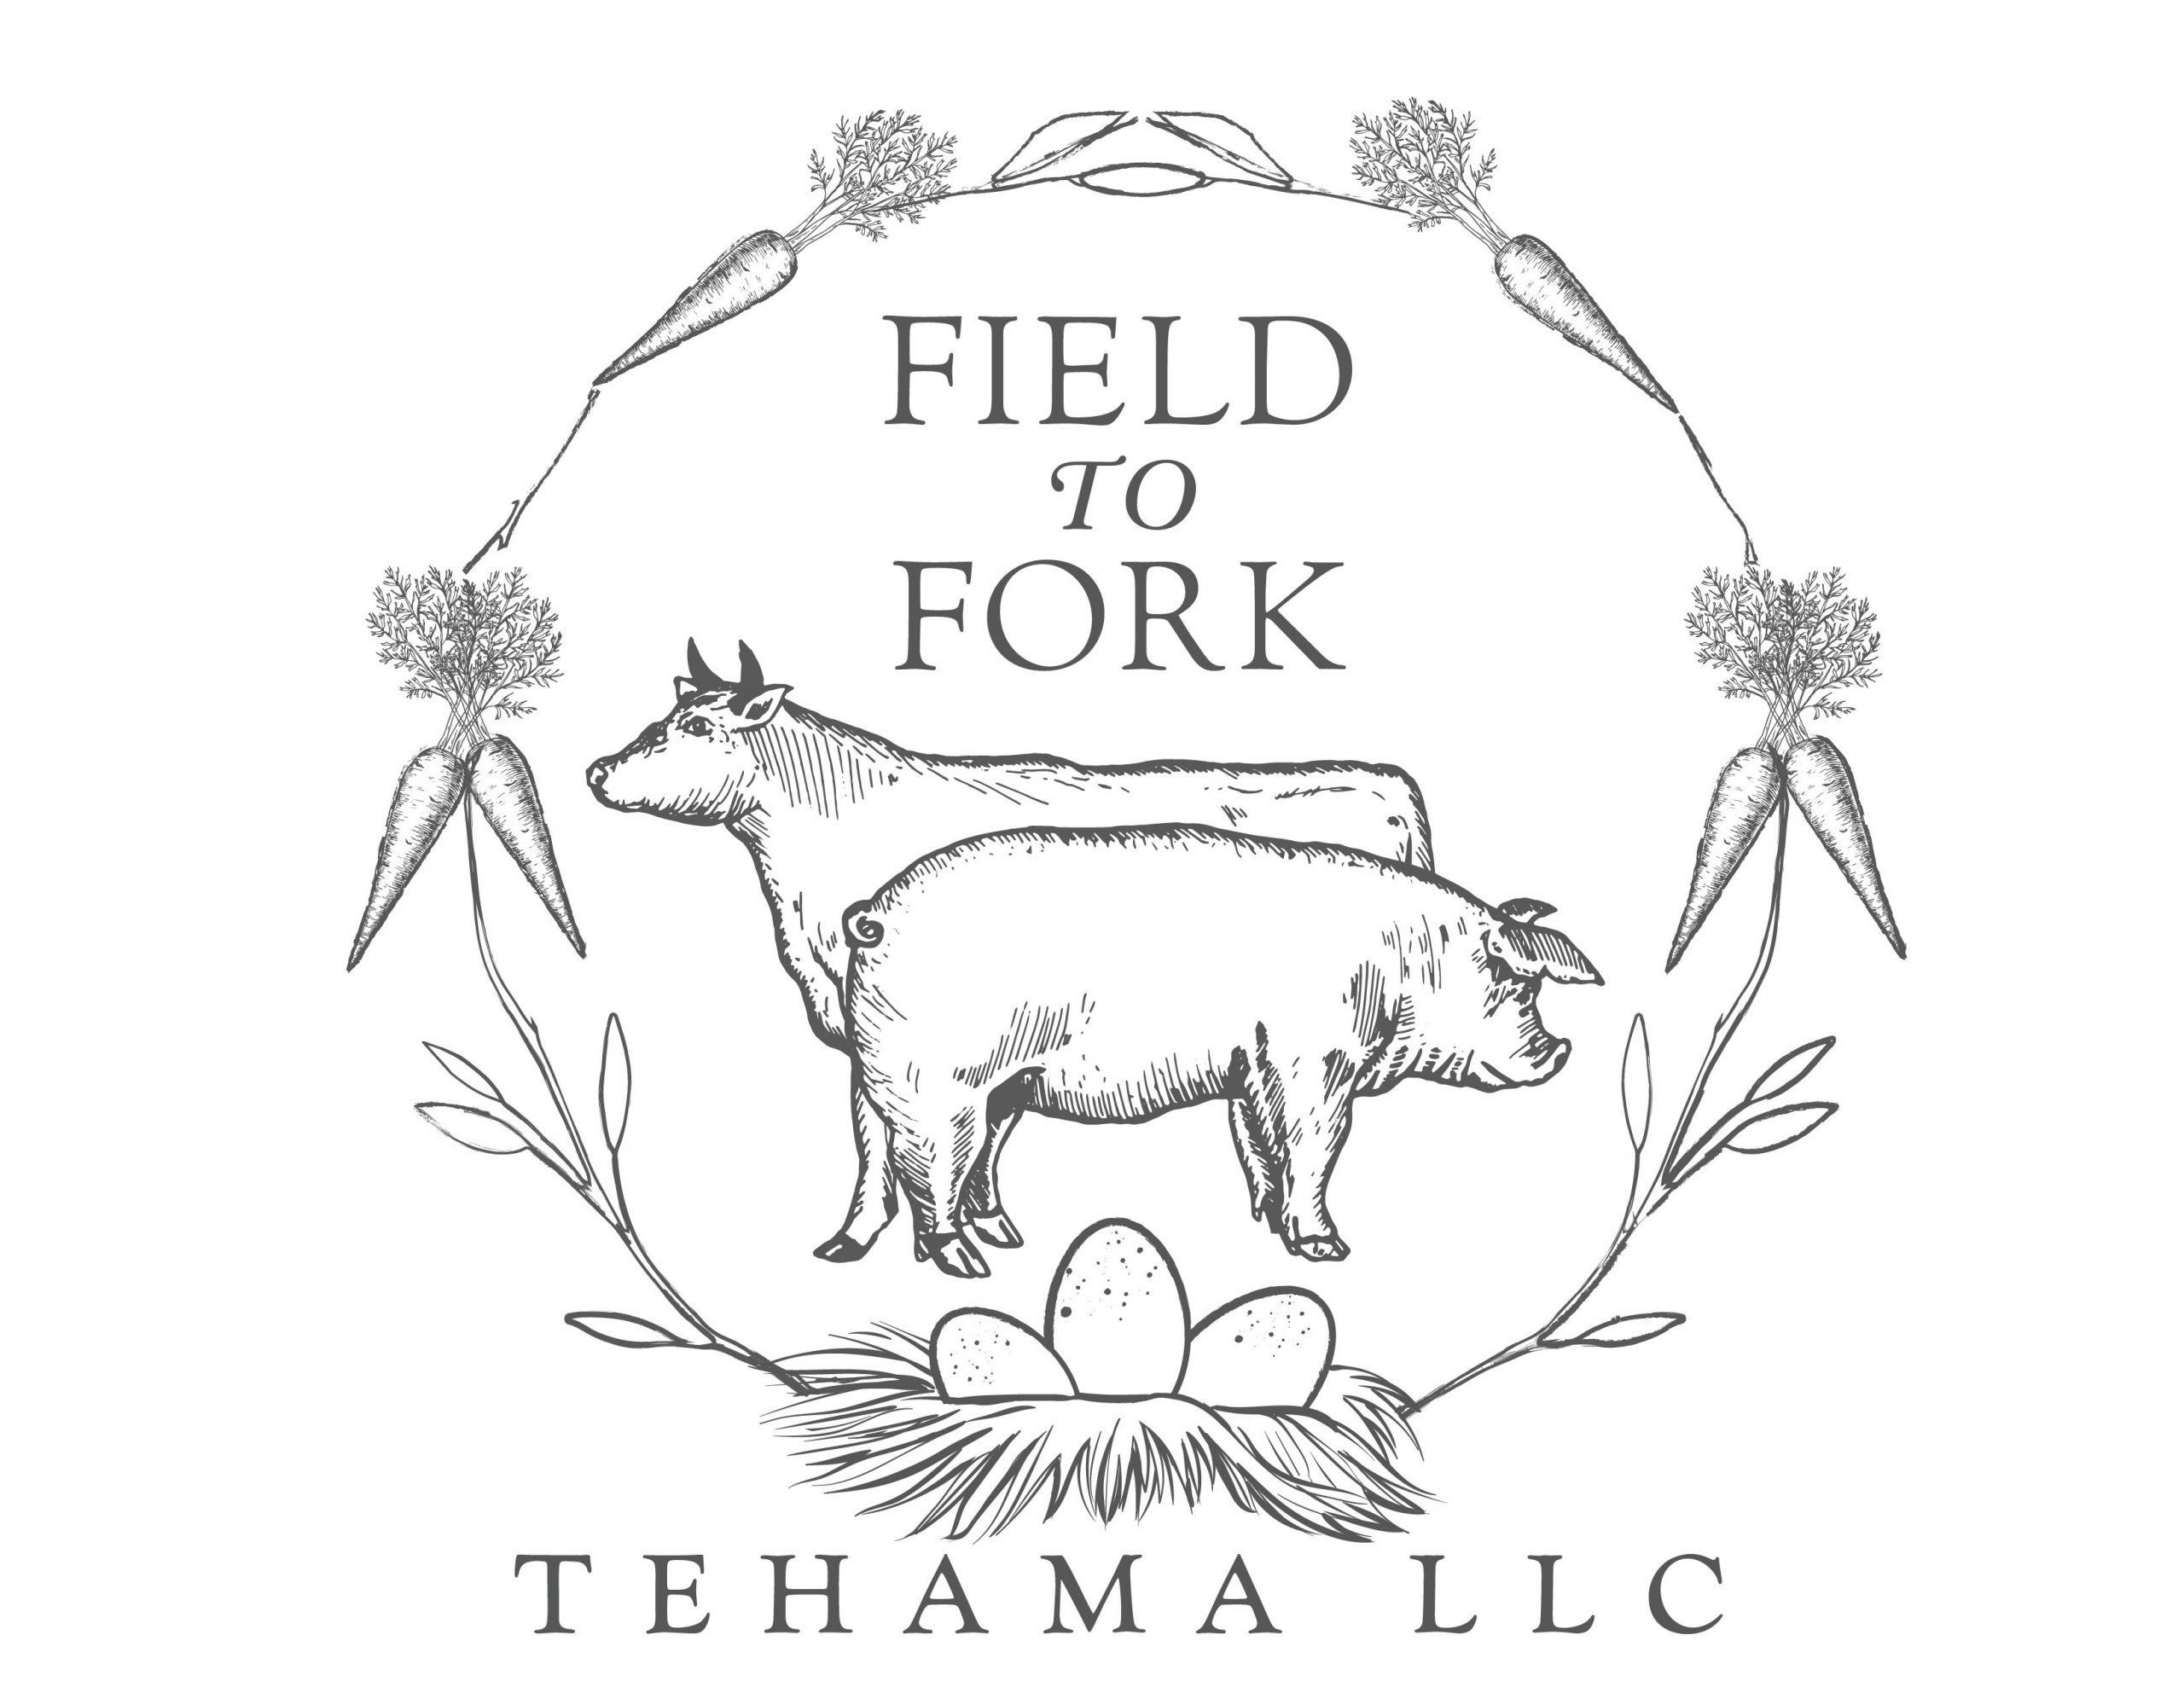 Field to Fork Tehama